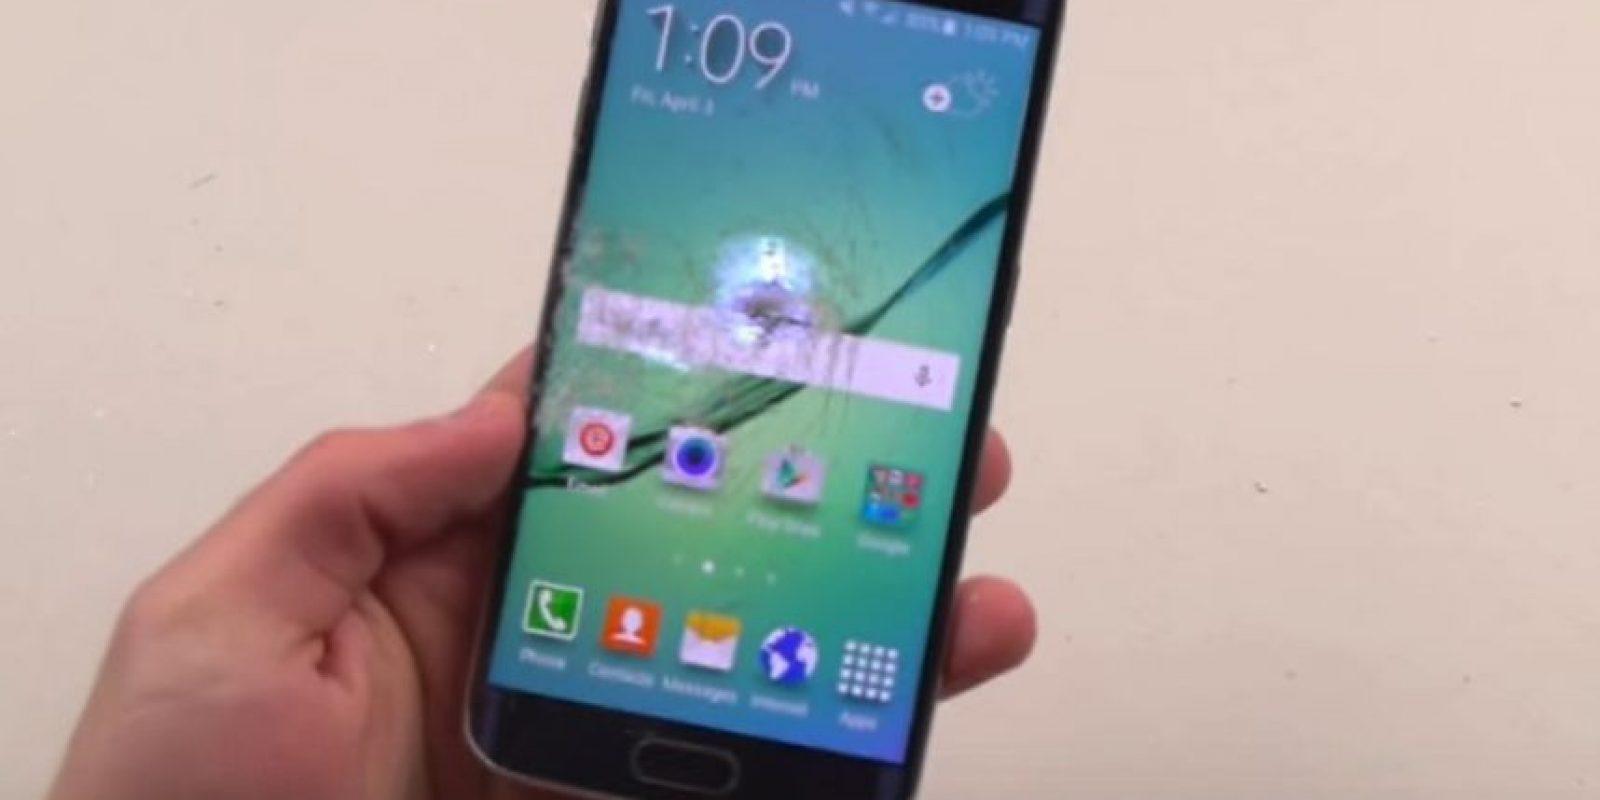 Samsung Galaxy S6 Edge Foto:TechRax / YouTube